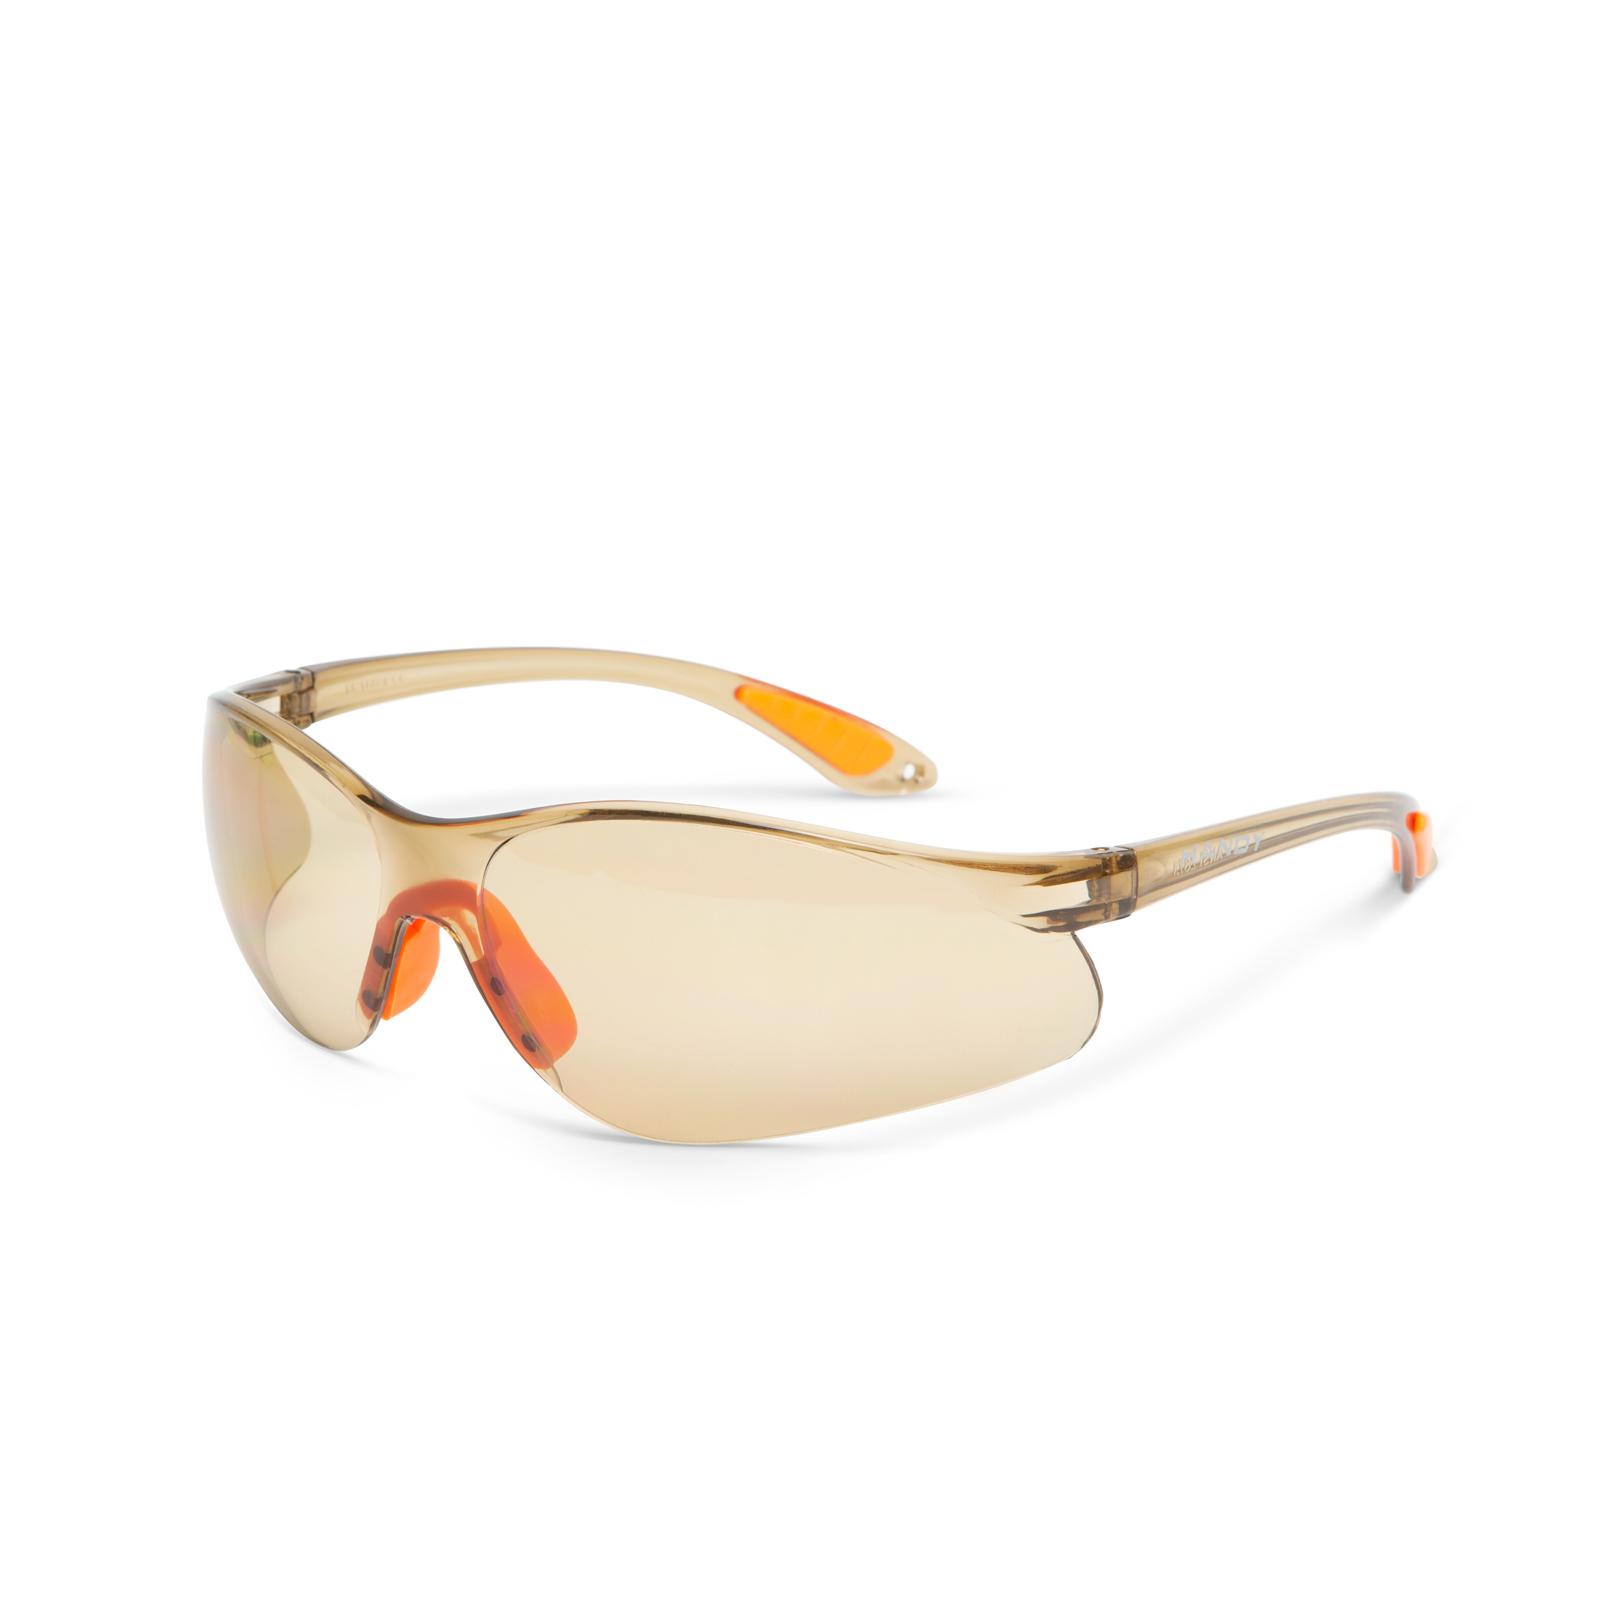 Ochelari de lucru cu protectie UV, amber